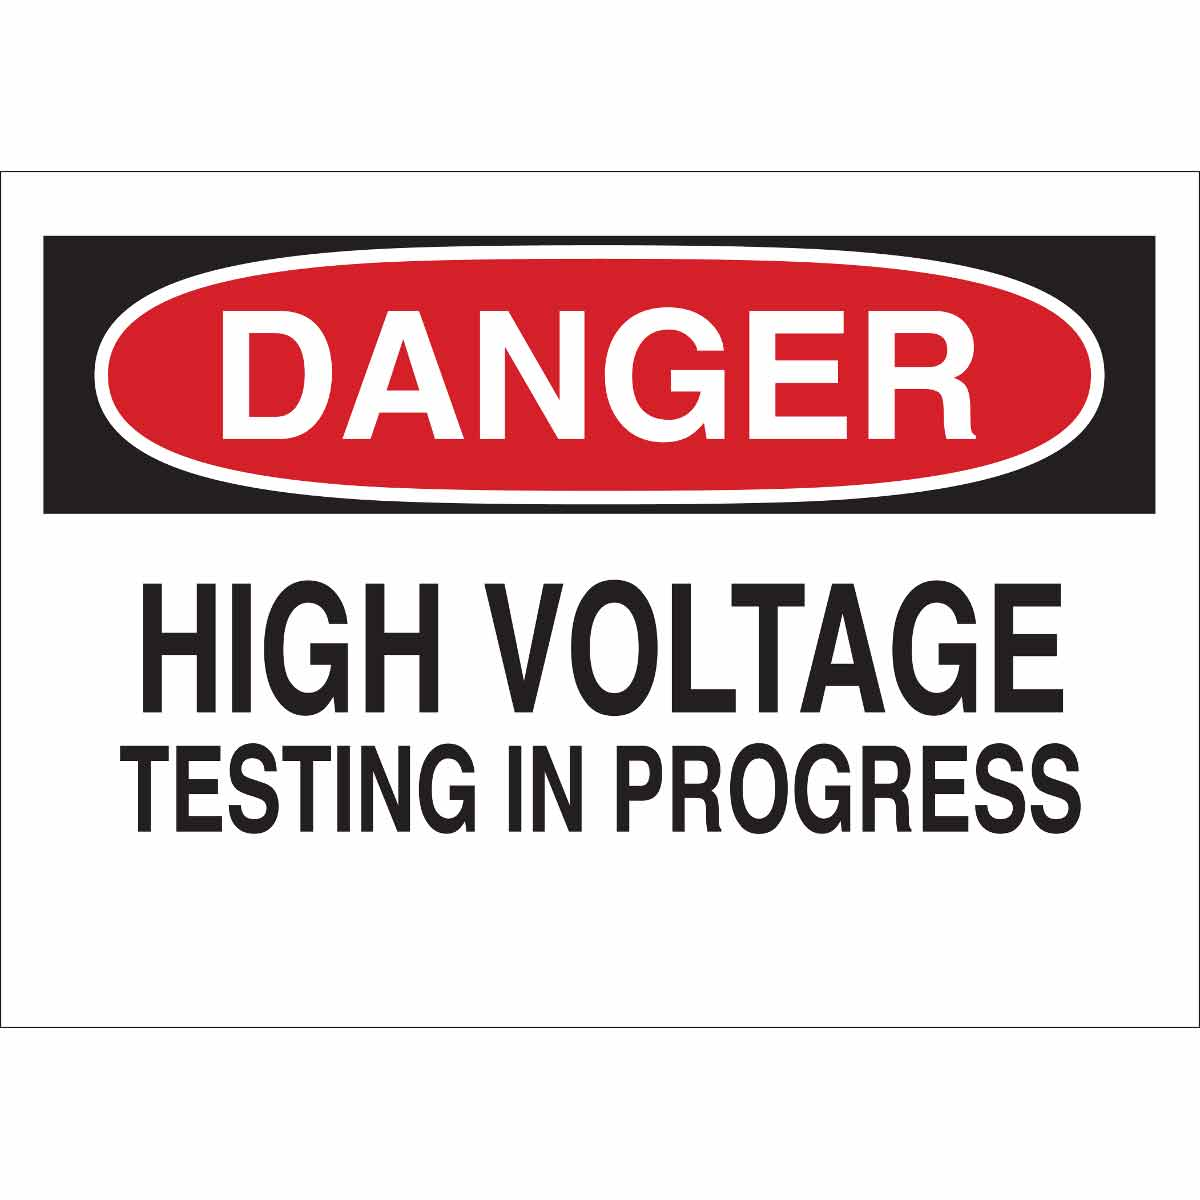 High Voltage Testing : Brady part danger high voltage testing in